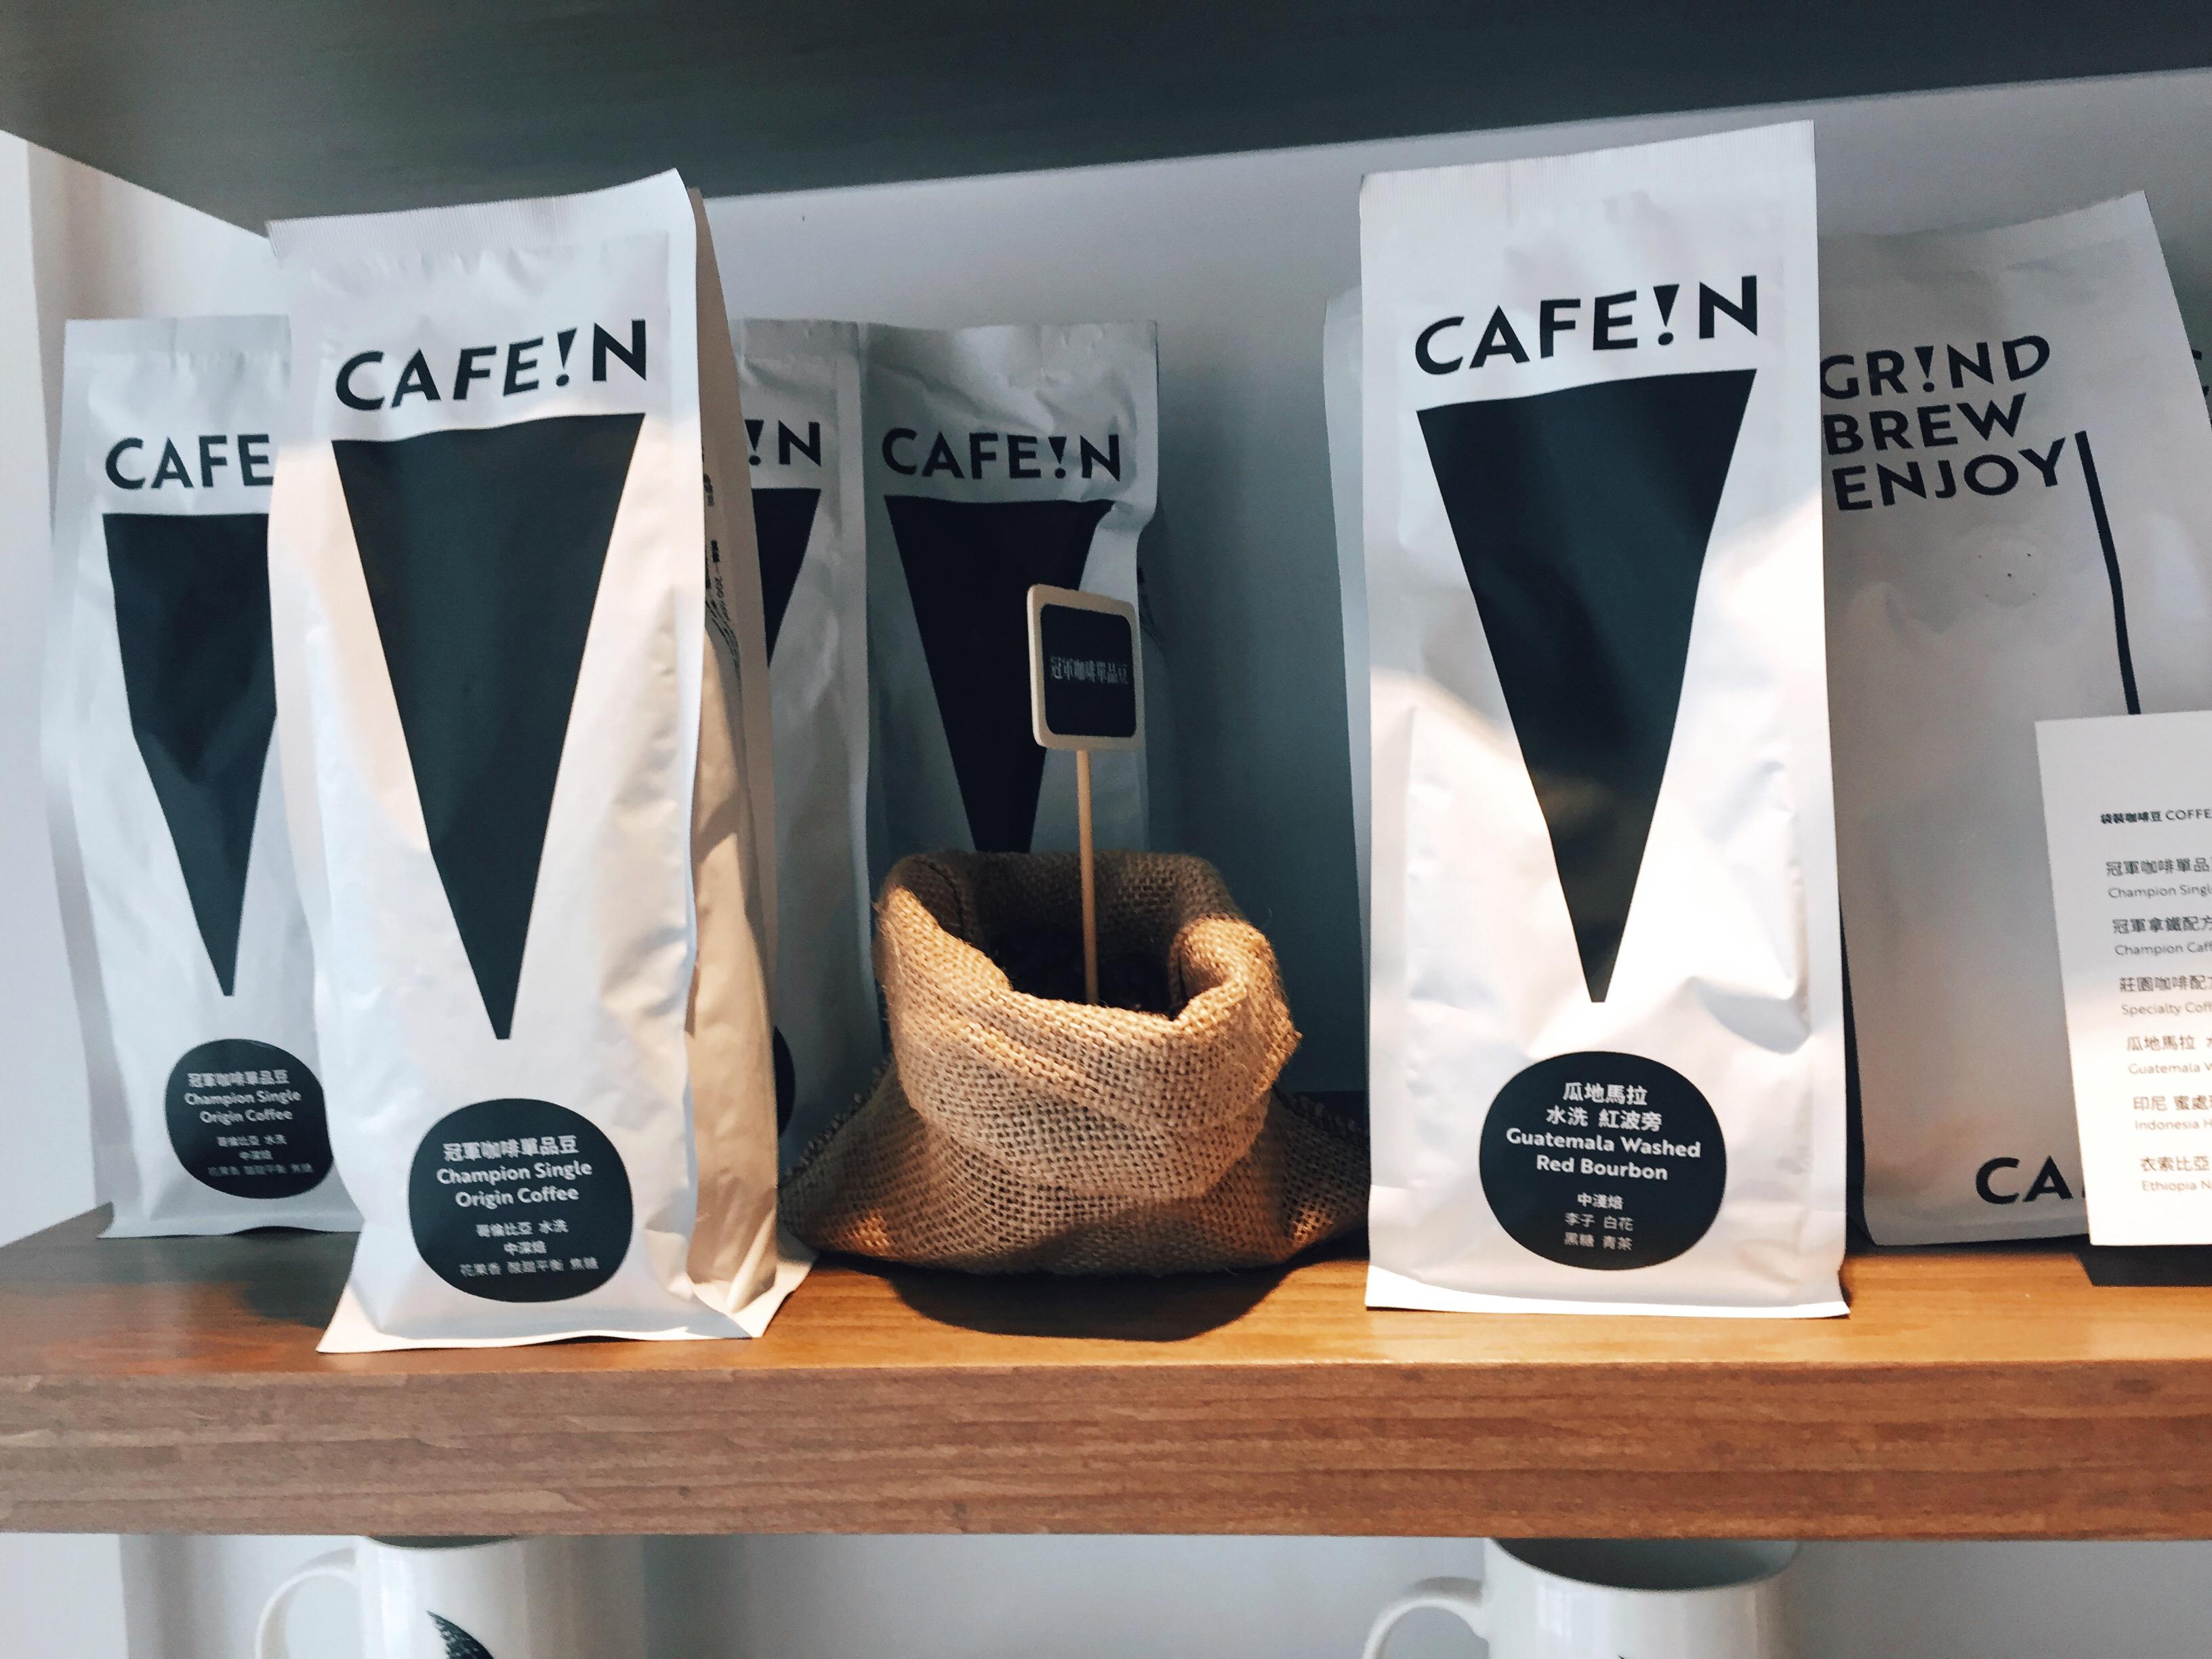 CAFE!N硬咖啡,台北東區咖啡店精品咖啡豆